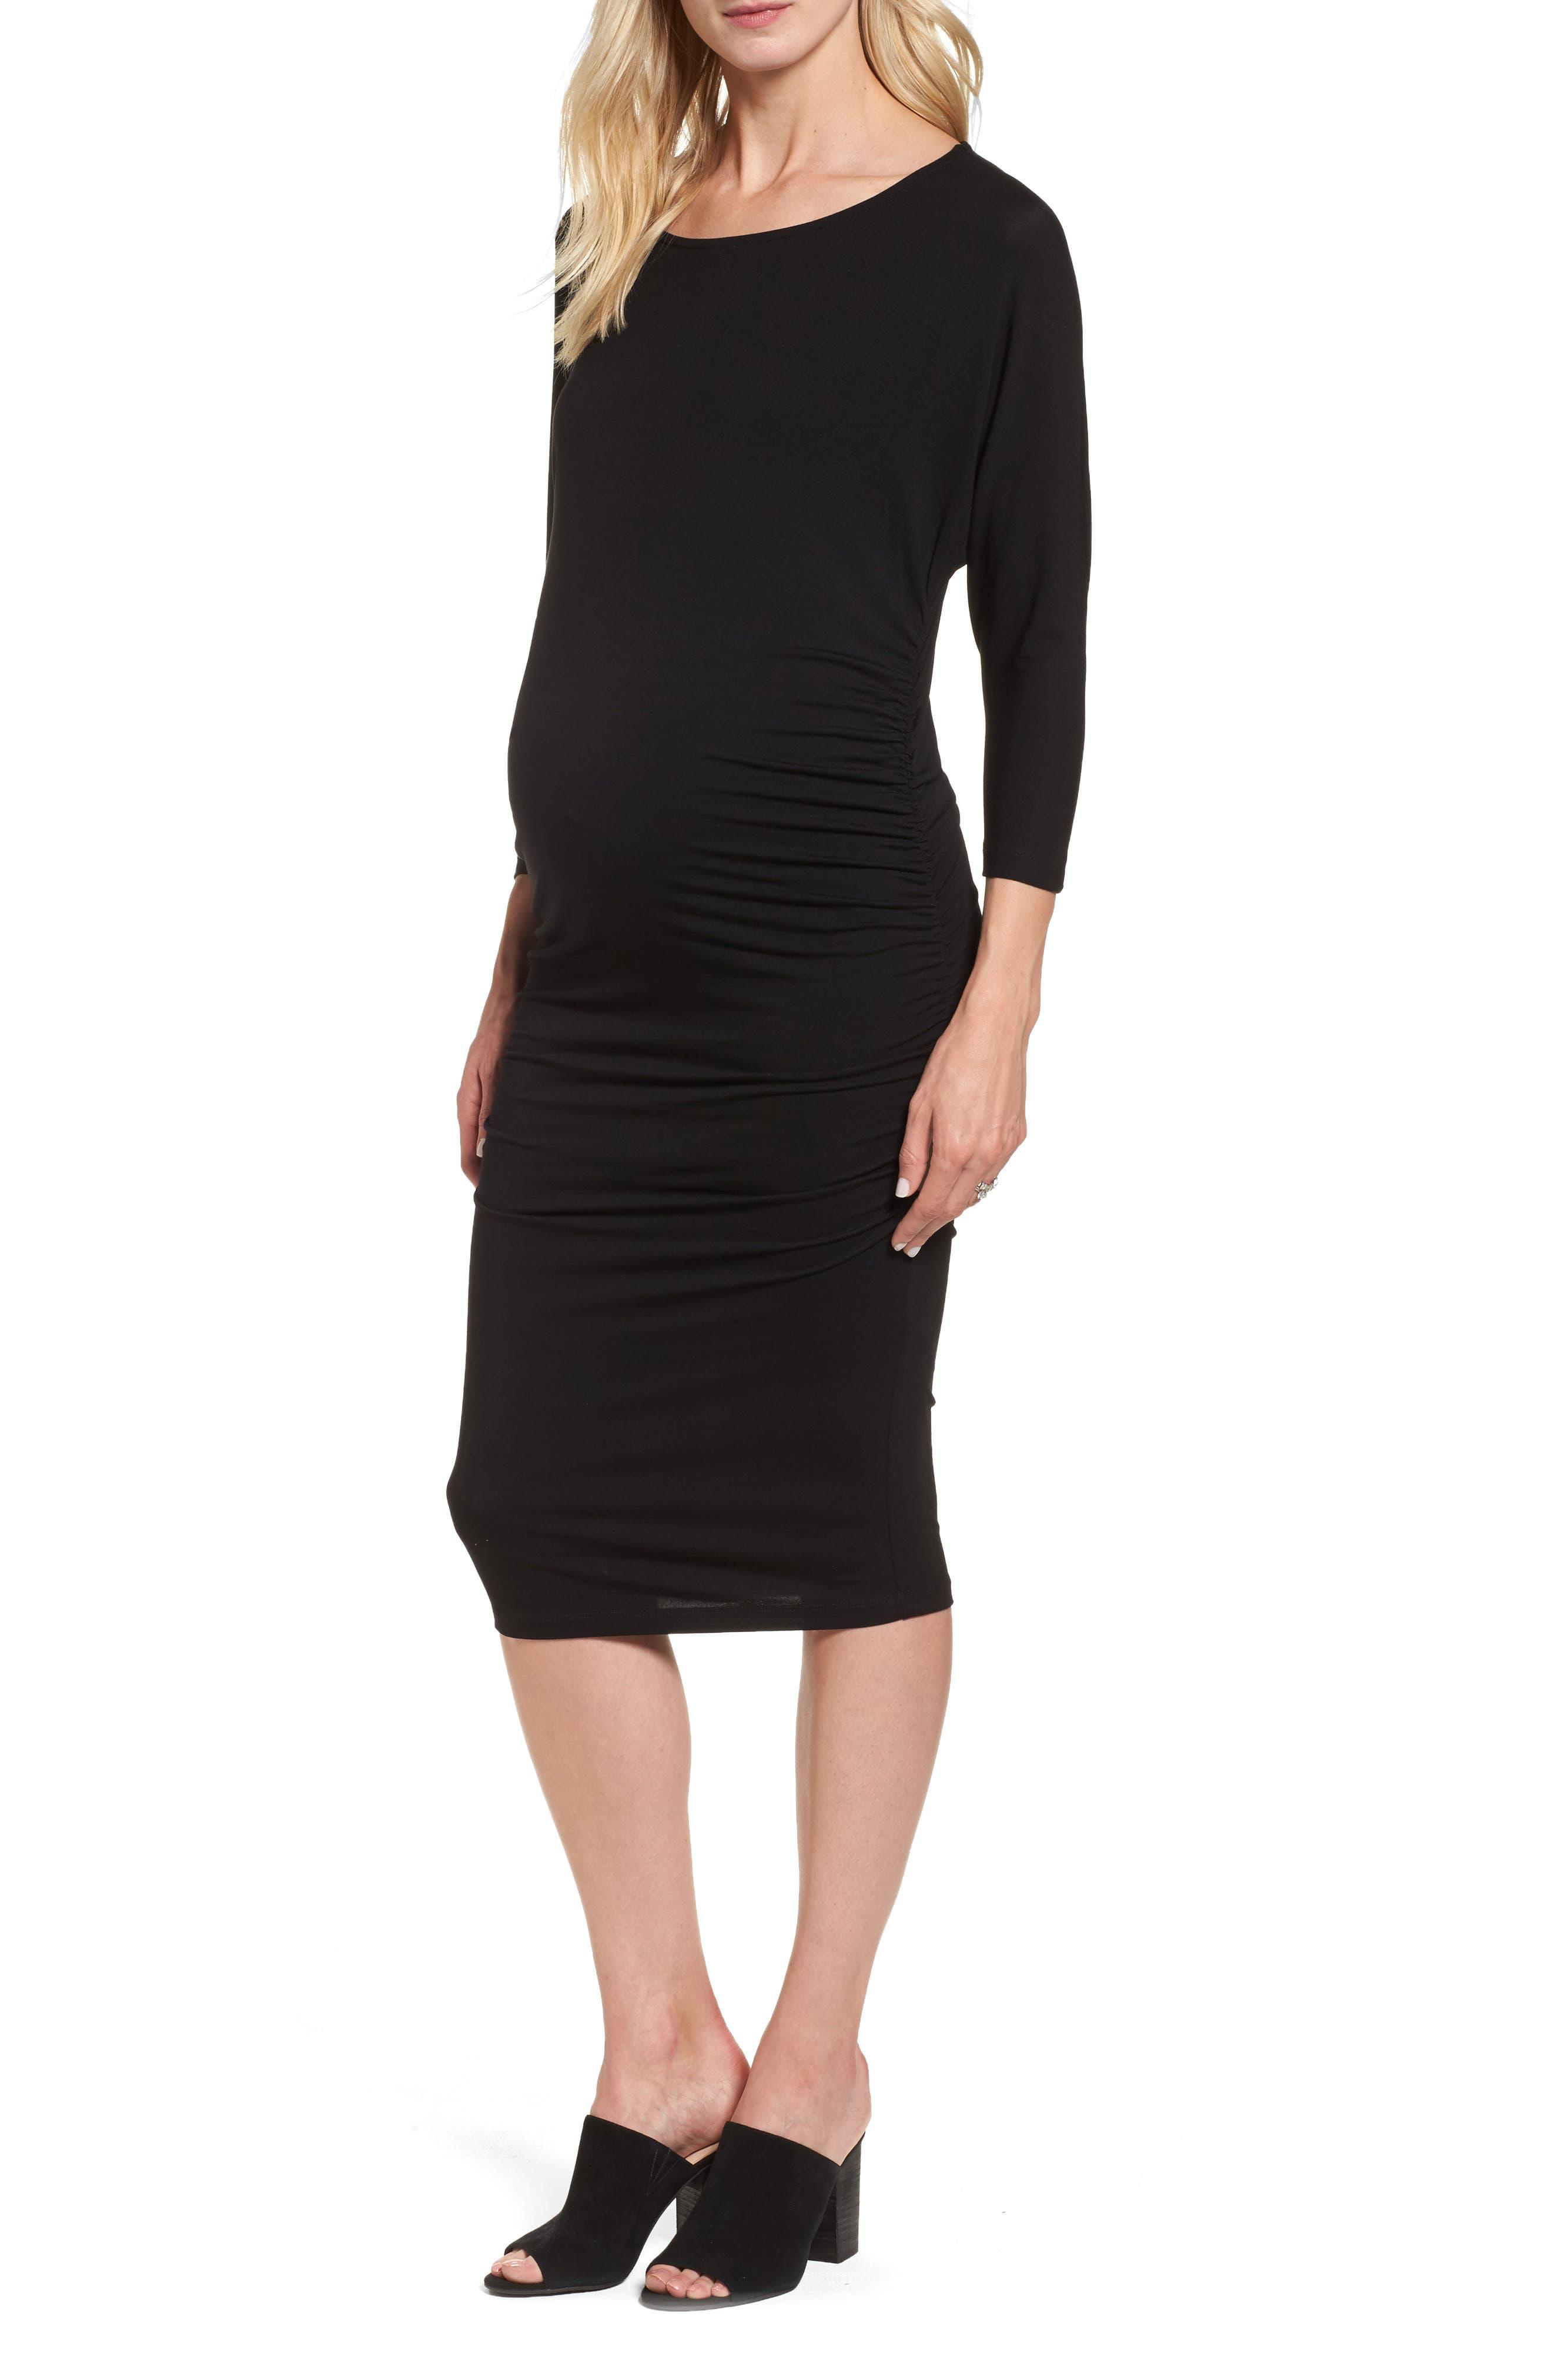 Isabella Oliver Jessa Maternity Dress